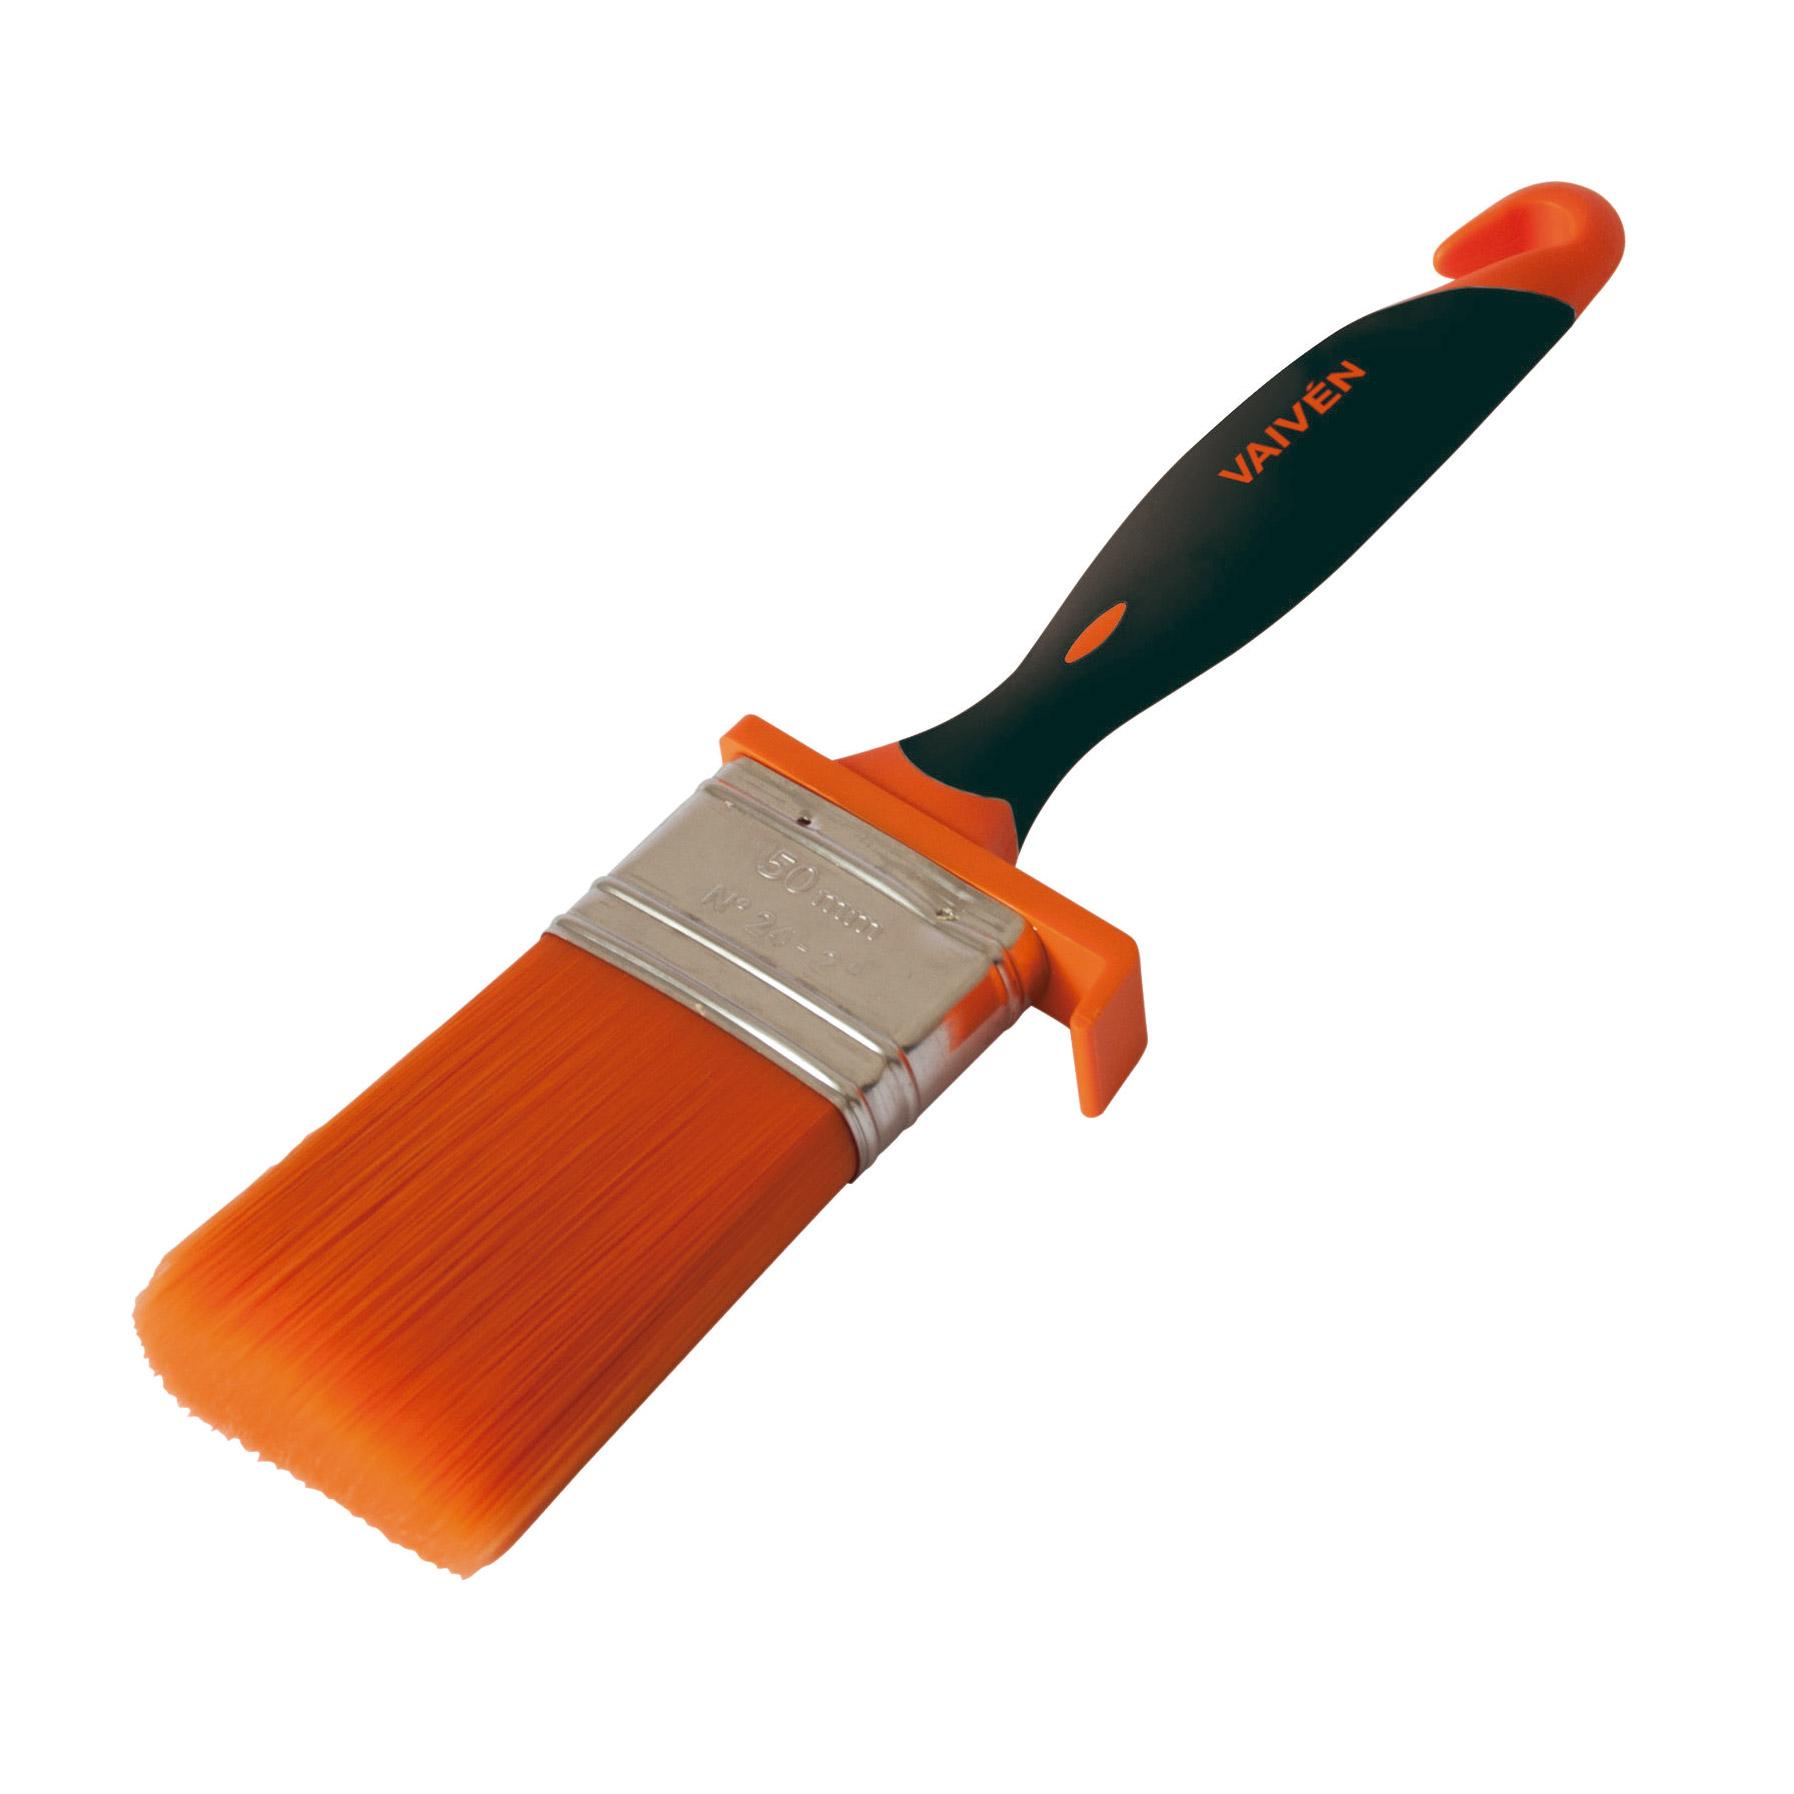 Кисть-флейц Vaiven velourex трехкомпонентная 60мм